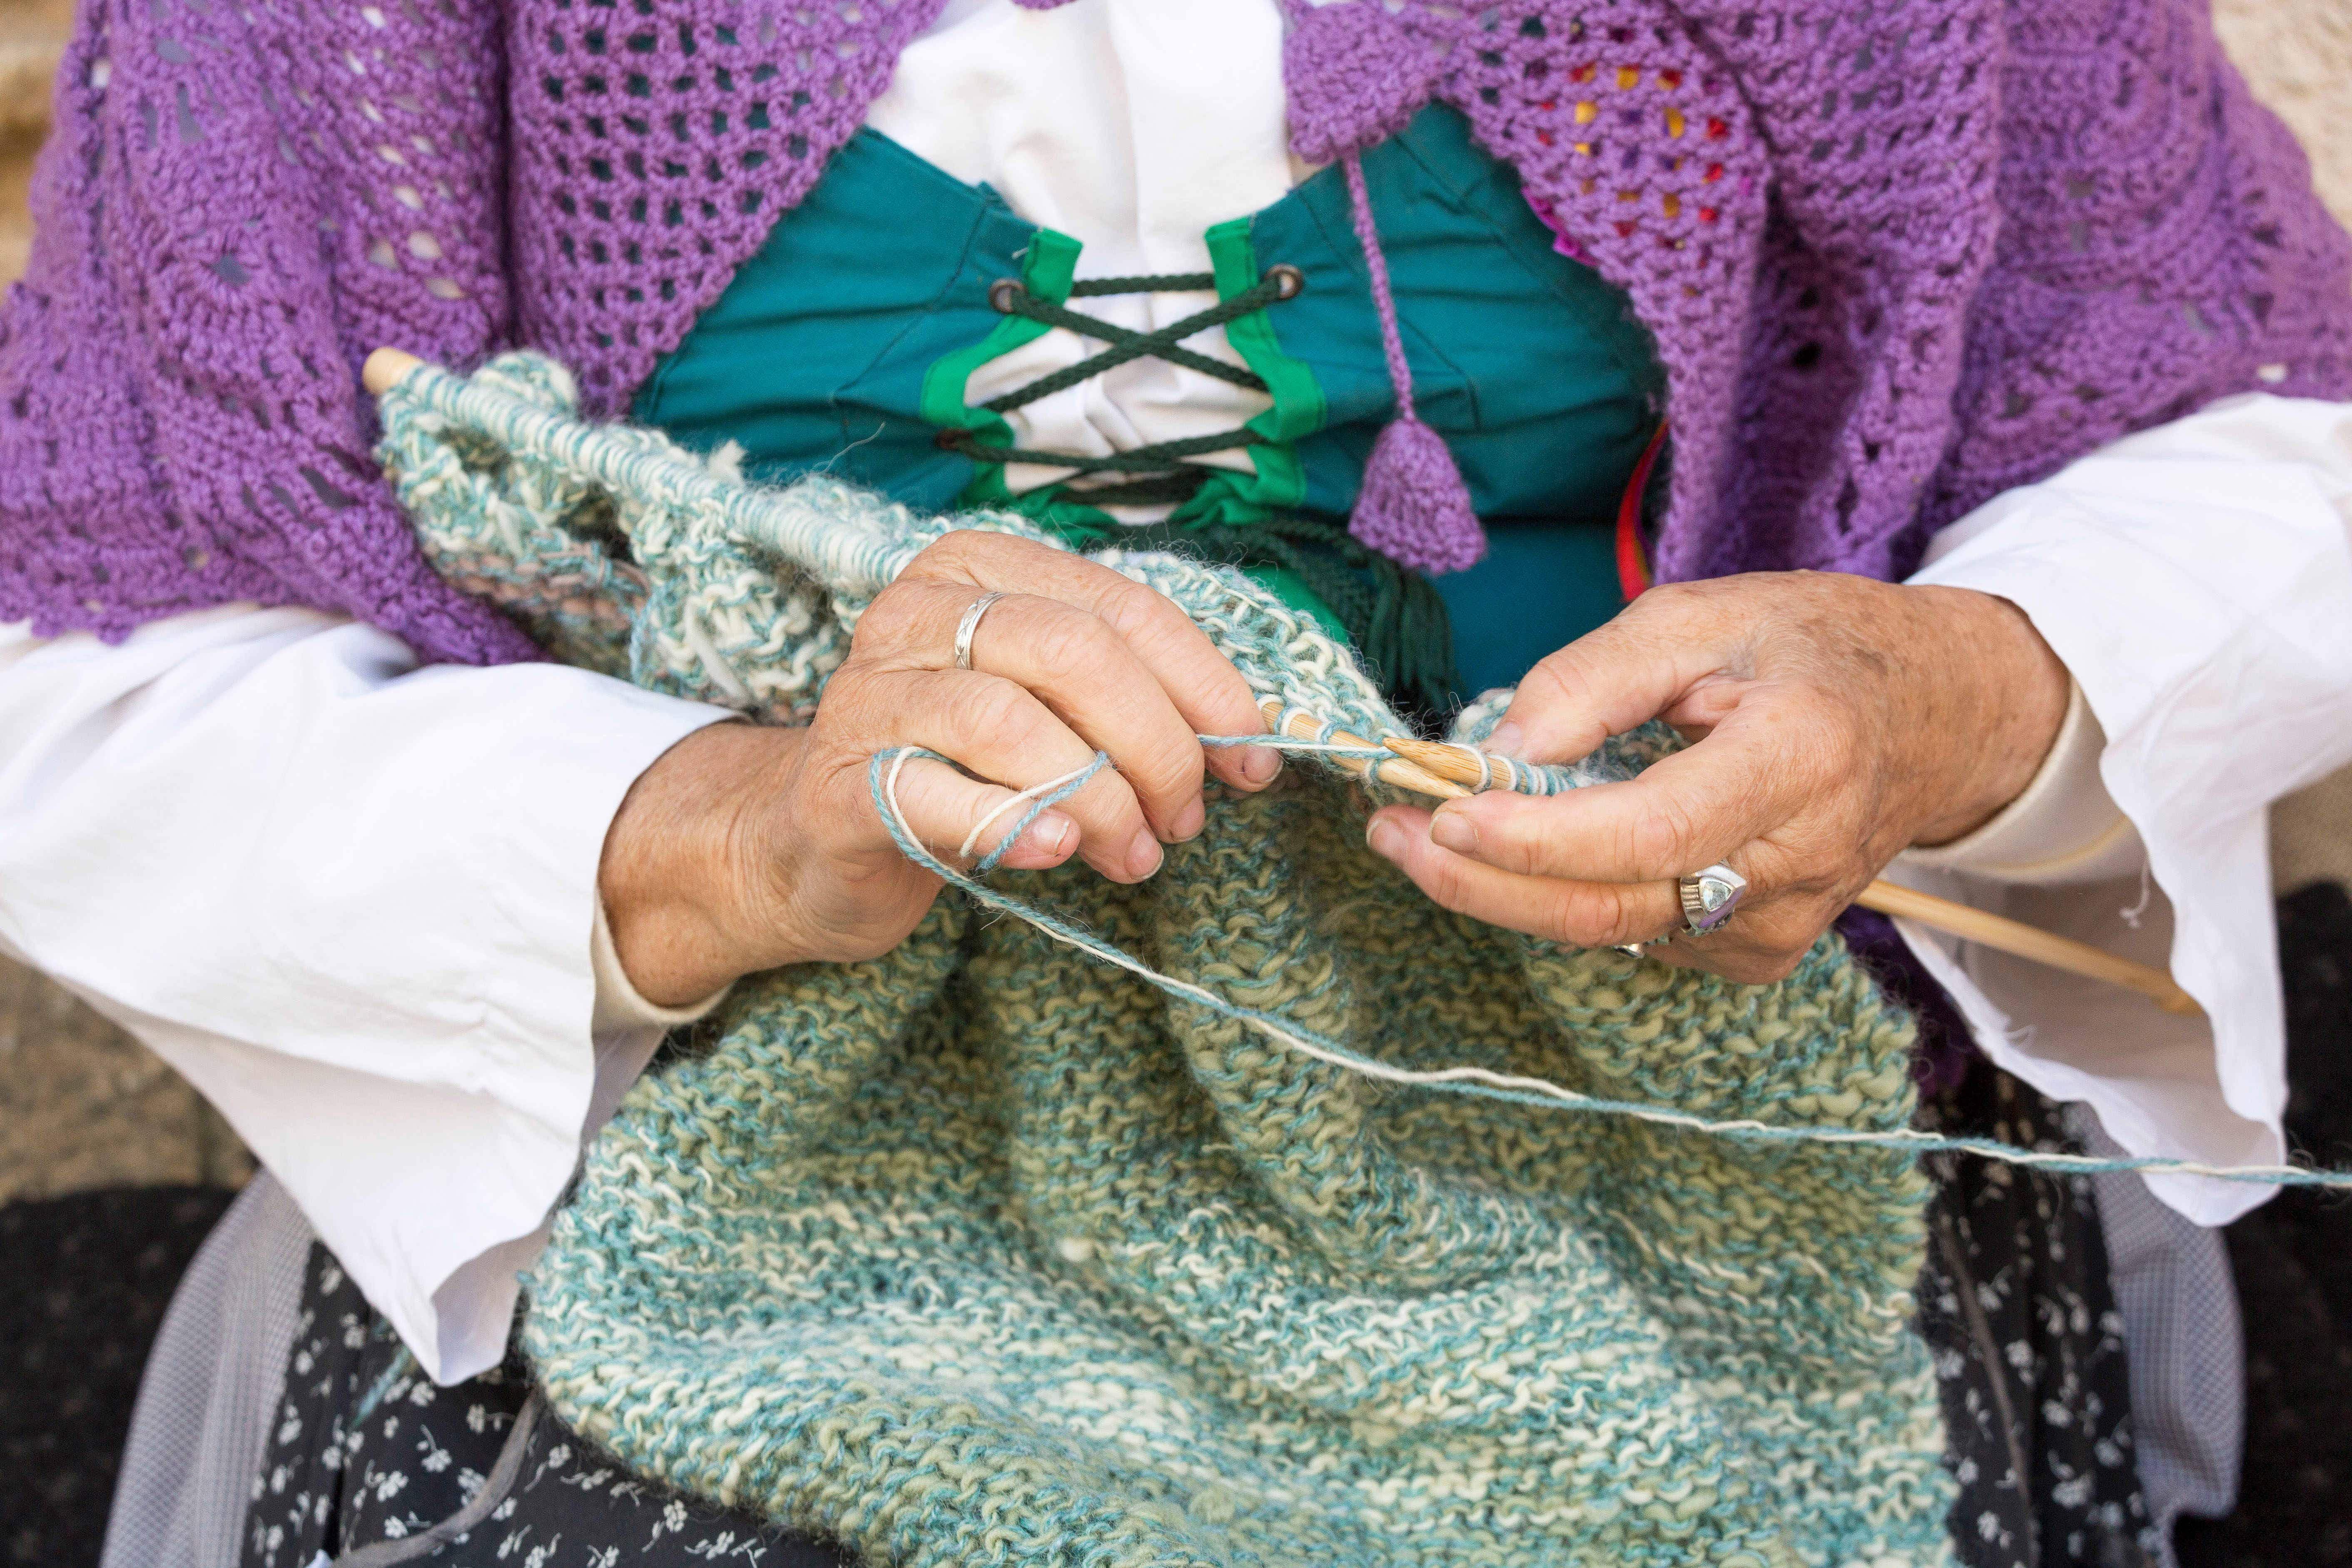 World's fastest knitter and 'hat architect' among stars of Scottish festival